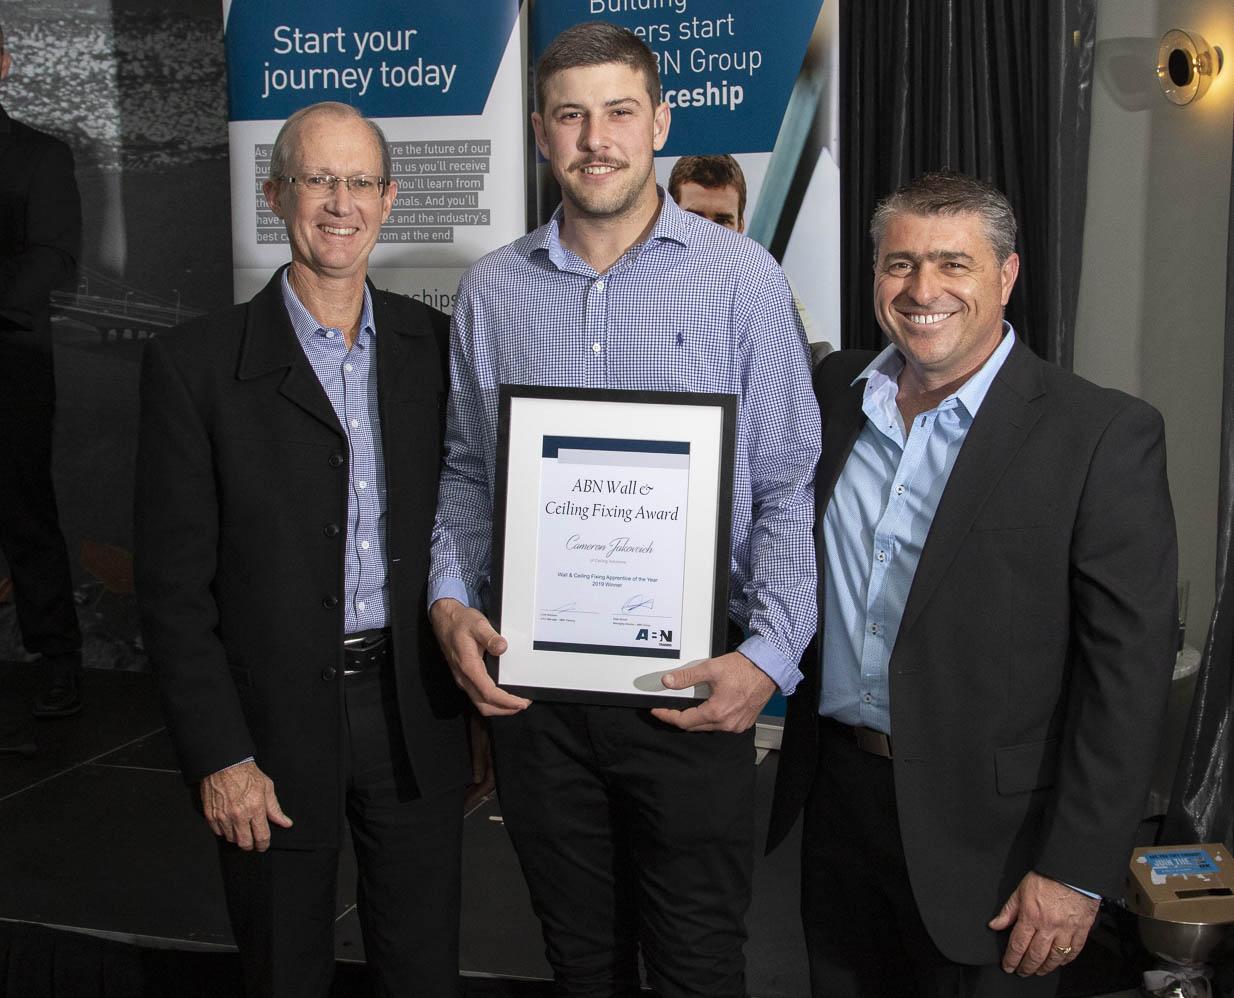 Cameron Scott, Plumber for Boeing Plumbing – 3rd year